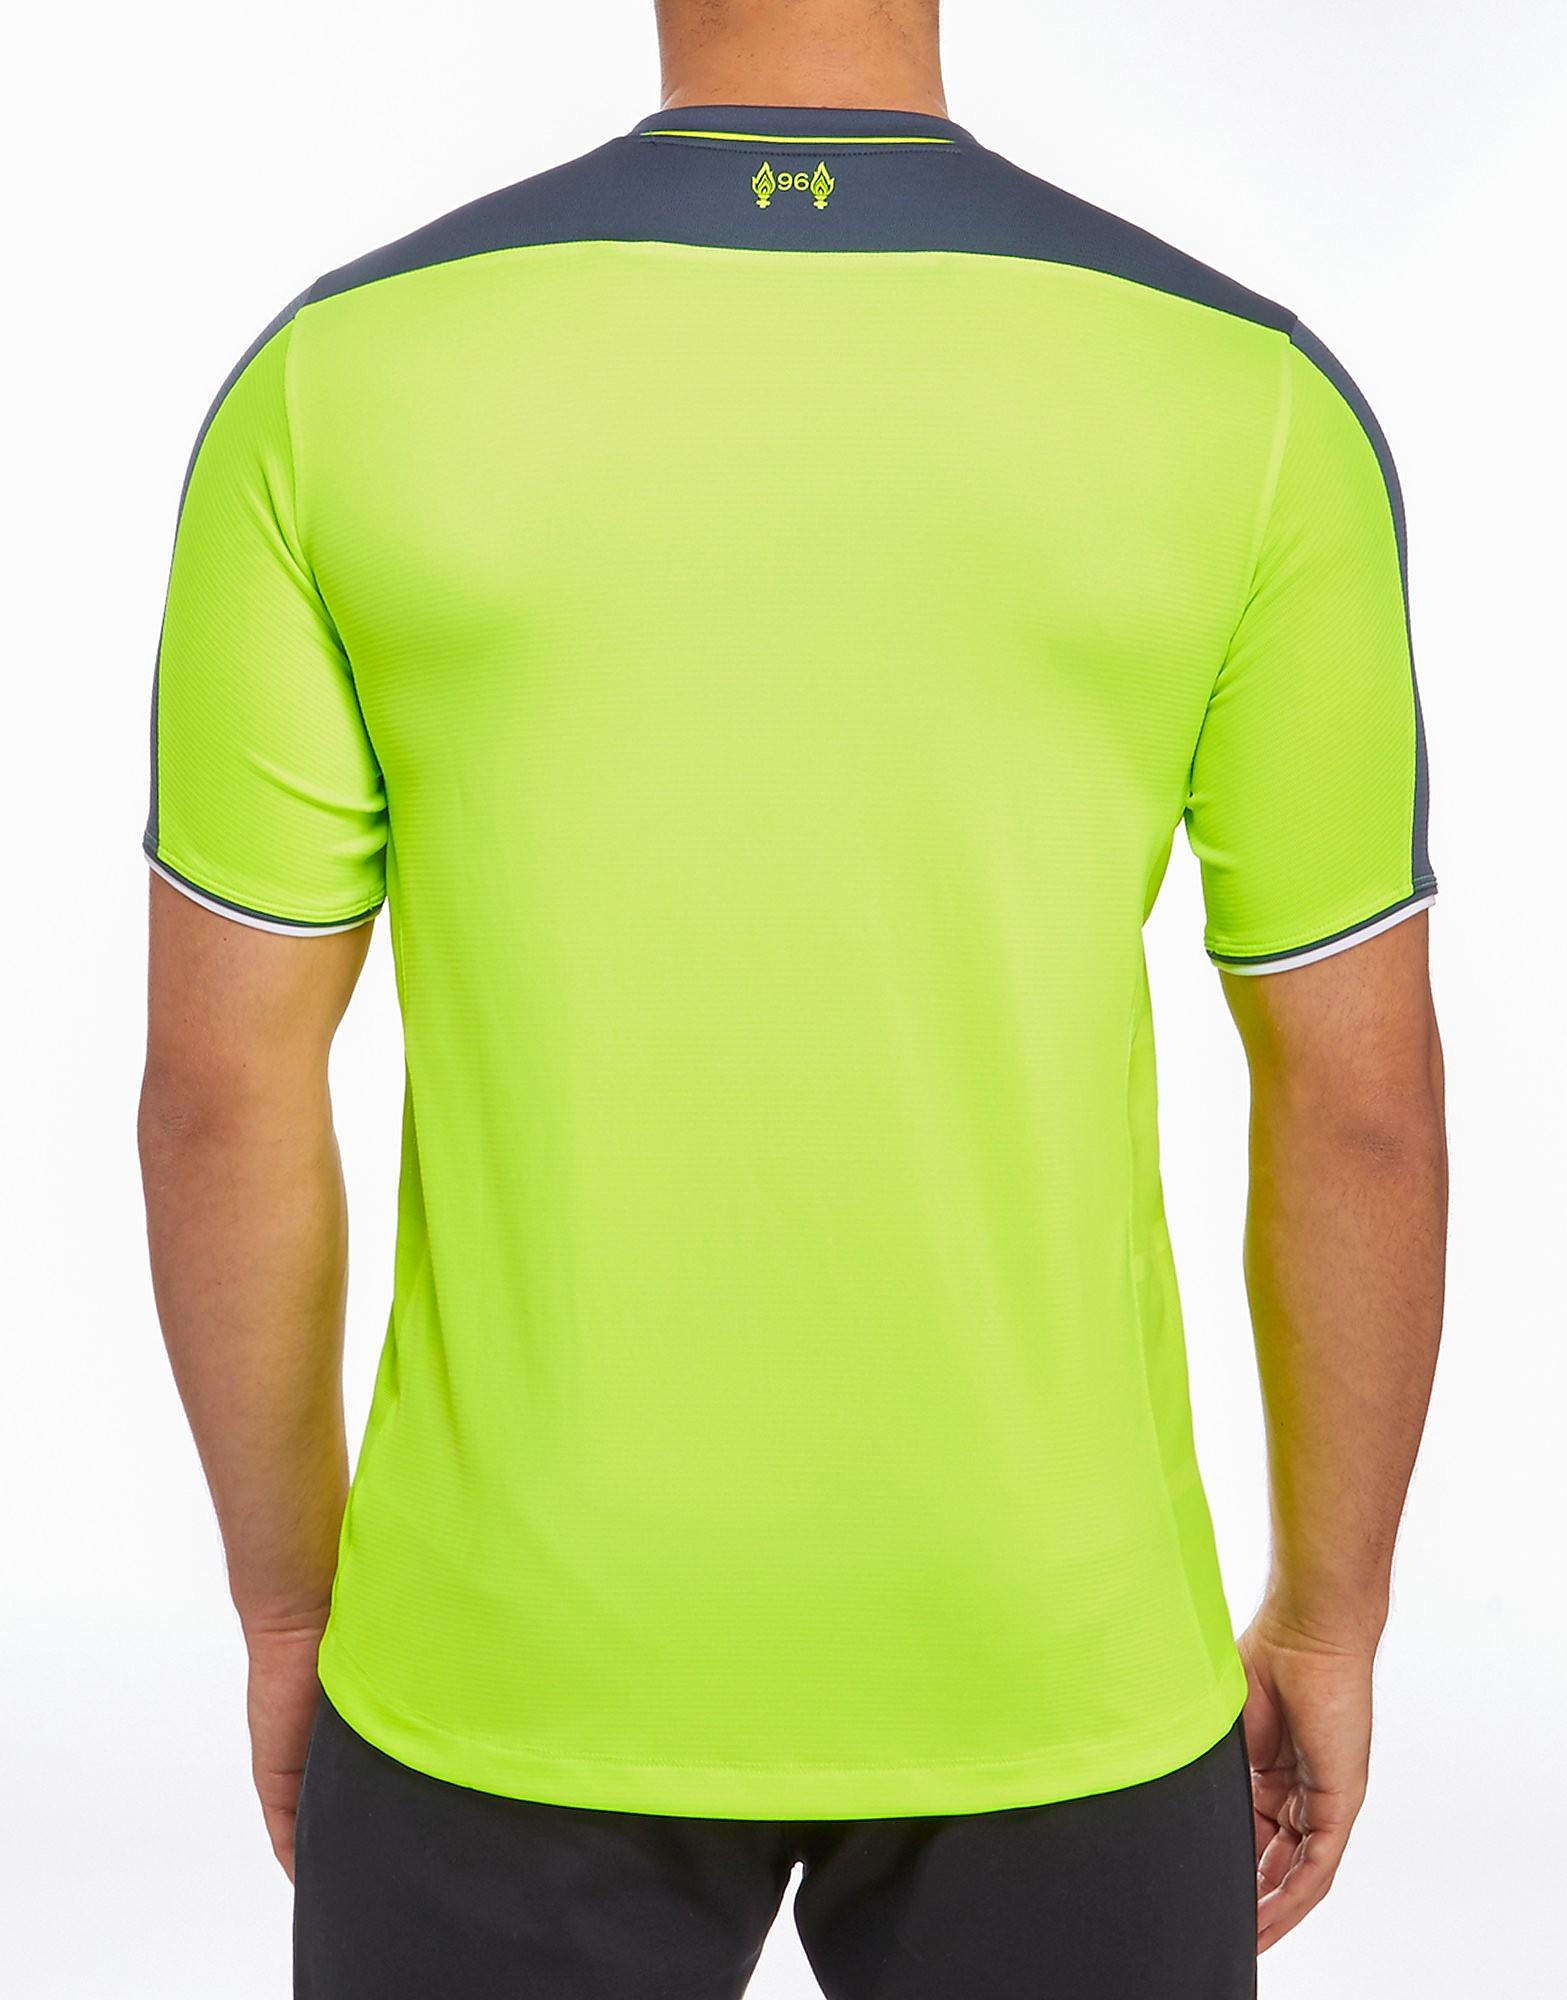 New Balance Liverpool FC 2016/17 Third Shirt